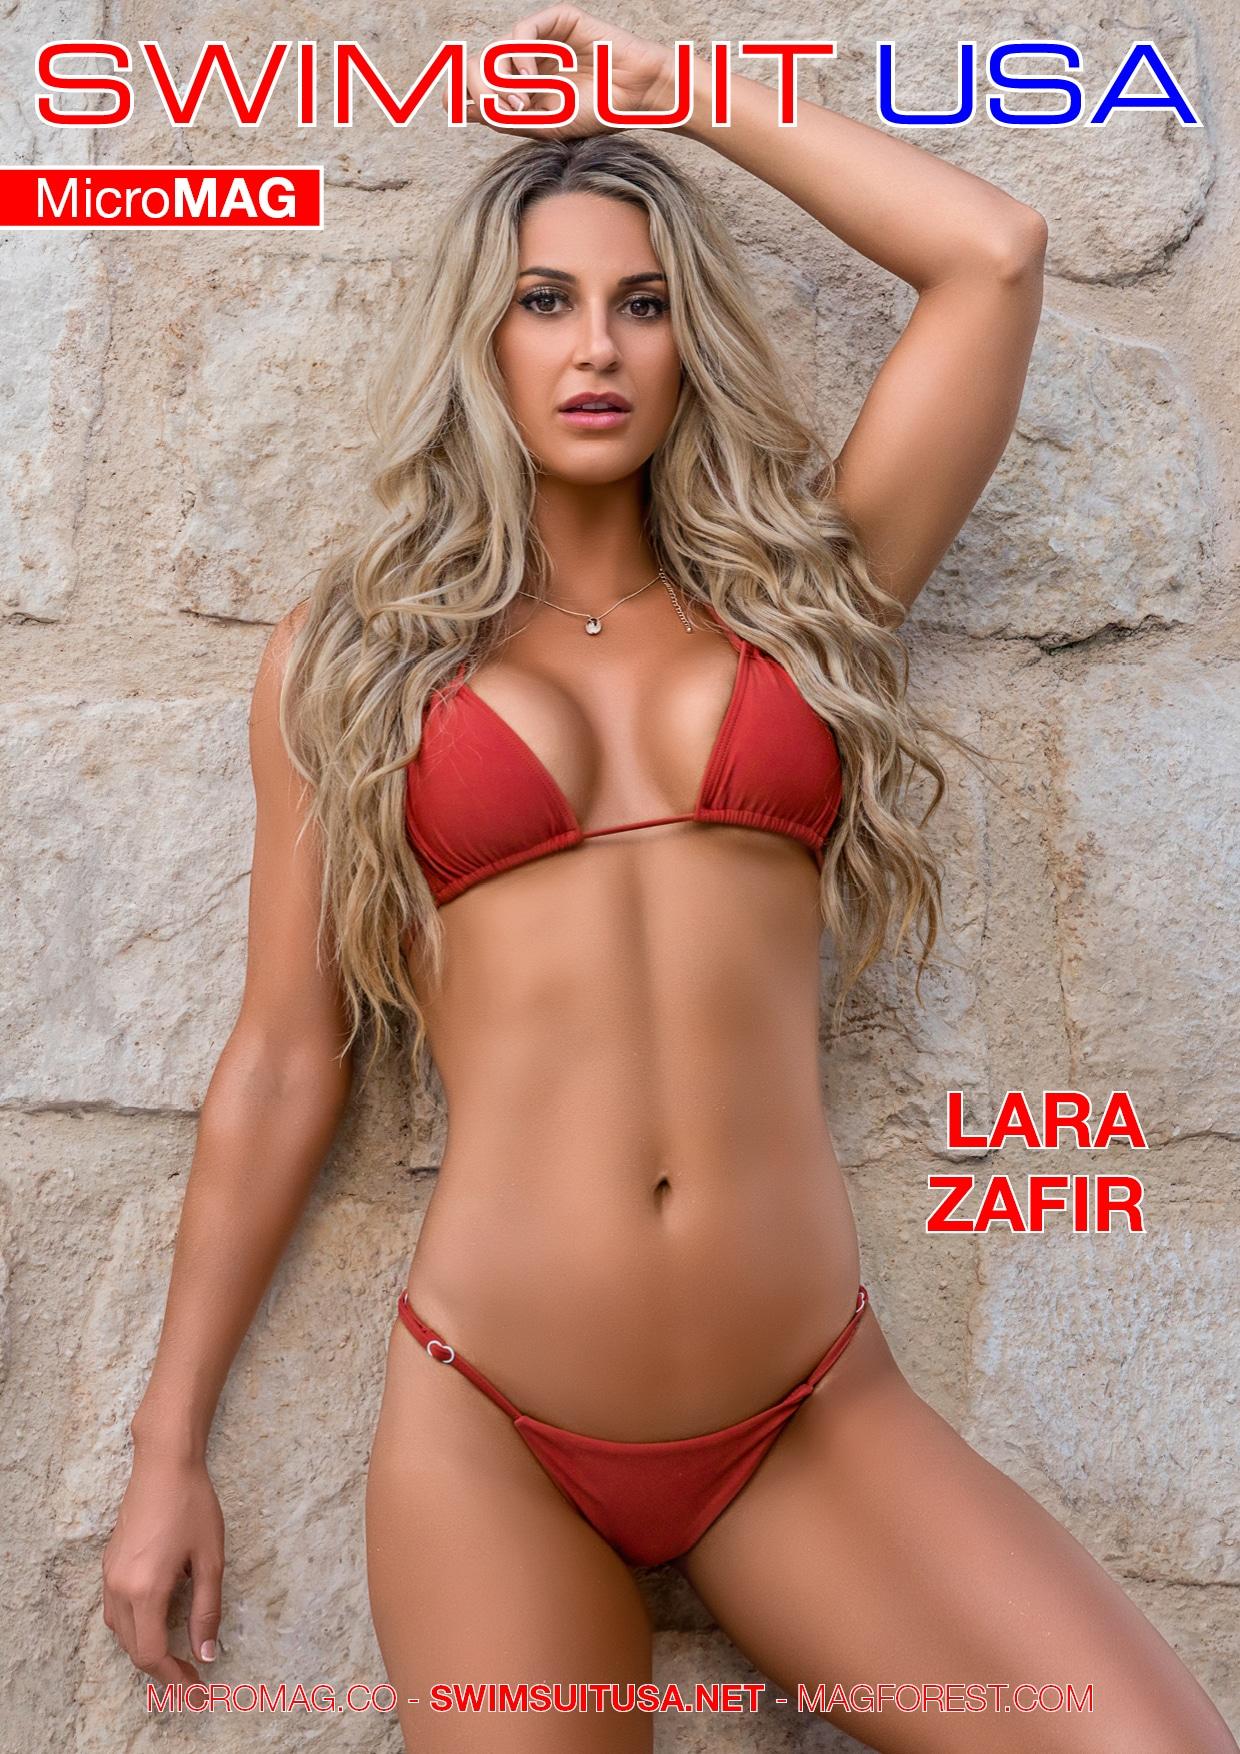 Swimsuit USA MicroMAG - Lara Zafir